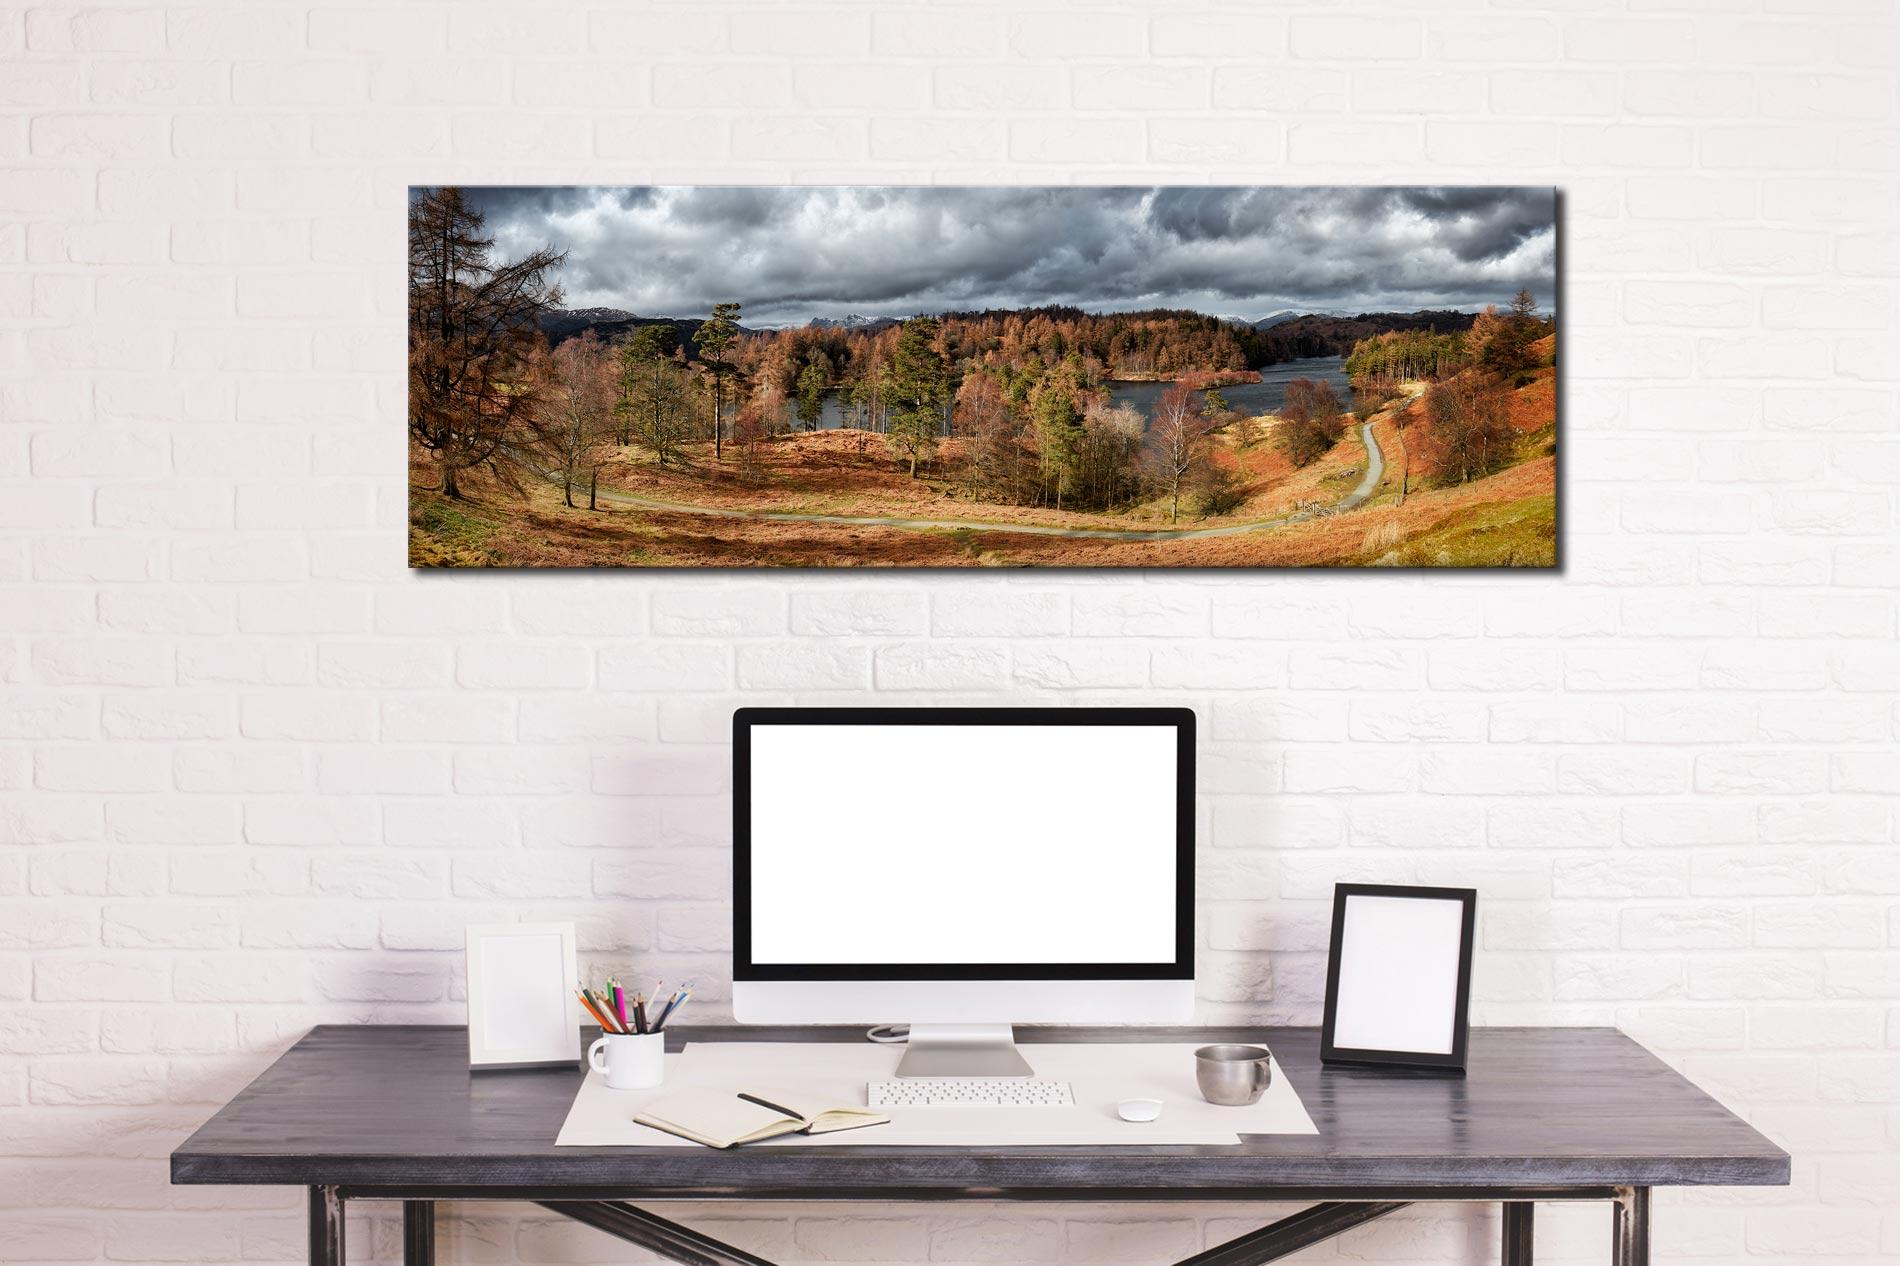 Tarn Hows Winter Colours - Print Aluminium Backing With Acrylic Glazing on Wall